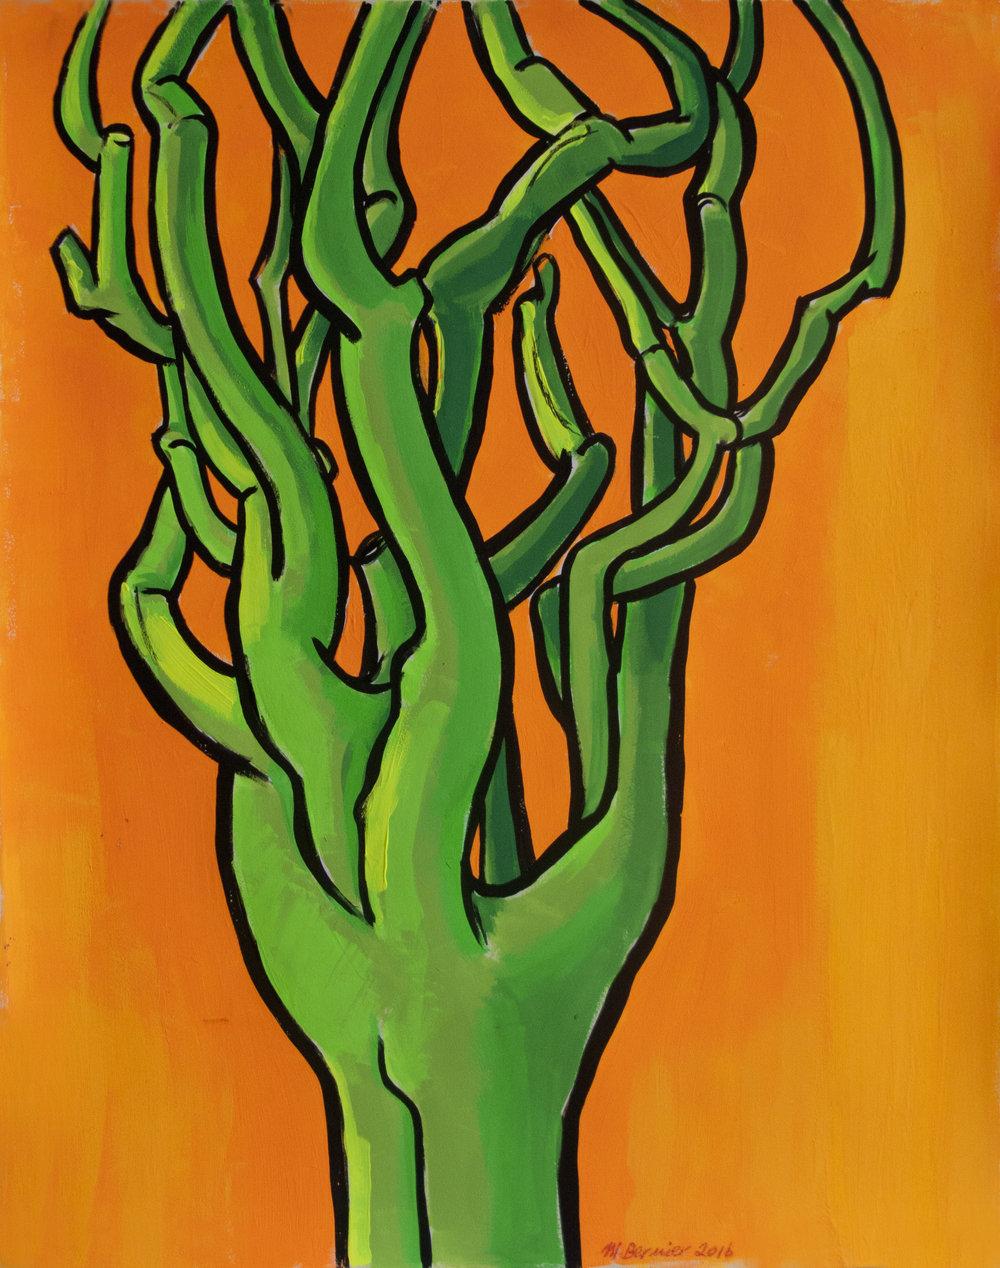 Green Pine (Orange Background) , 24 x 19 inches, gouache, 2016